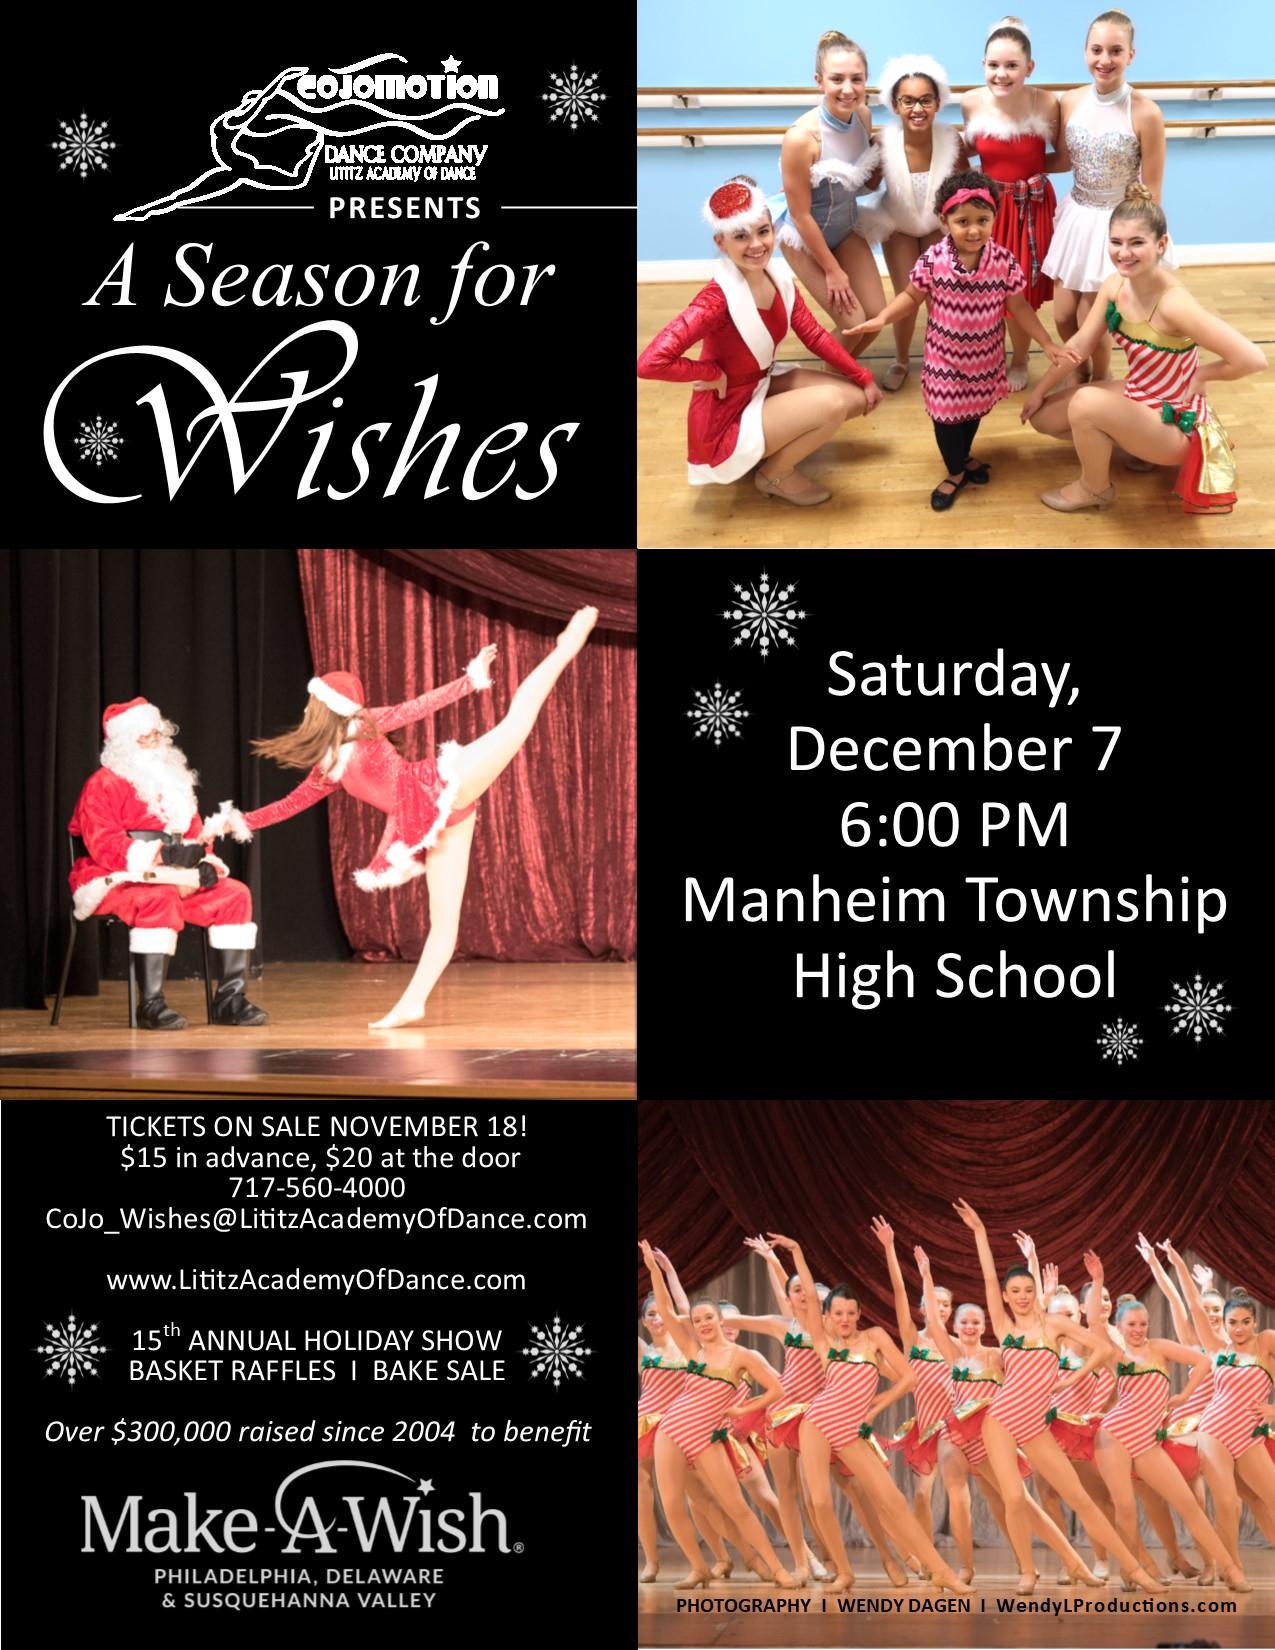 A Season For Wishesrsvpa Intended For Manheim Township School Calendar